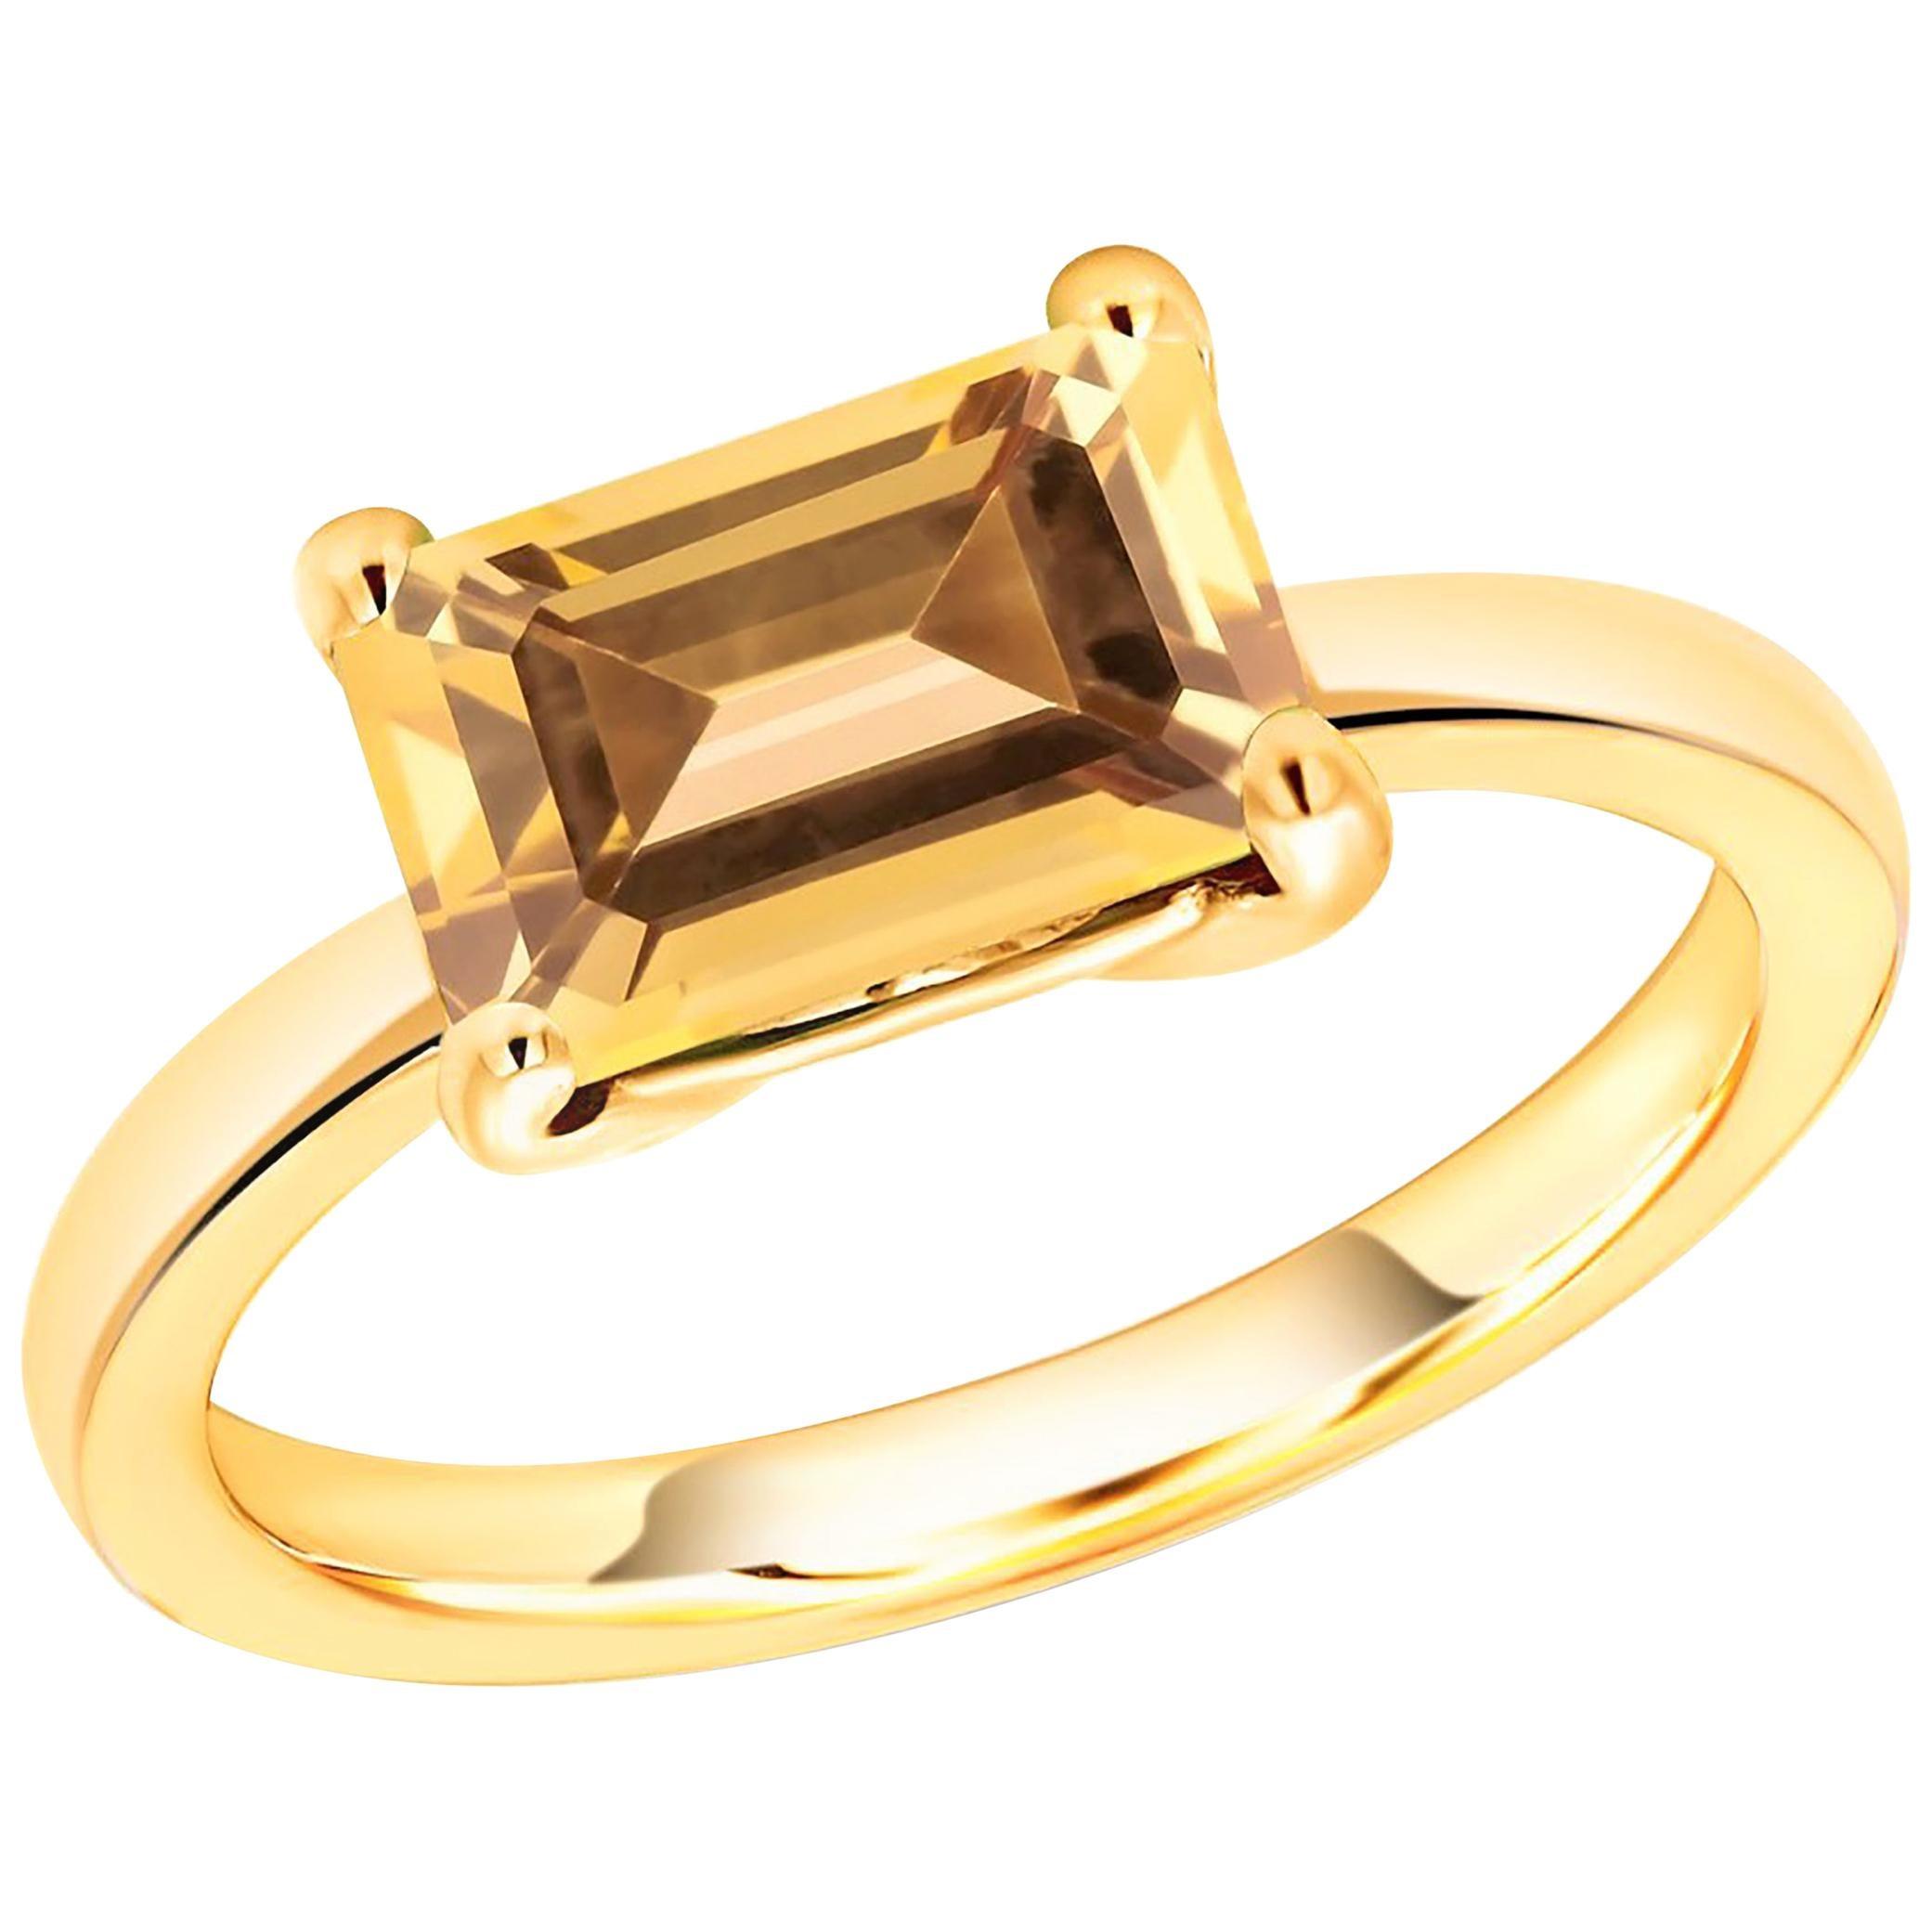 14 Karat Yellow Gold Ceylon Emerald Shape Yellow Sapphire Cocktail Ring